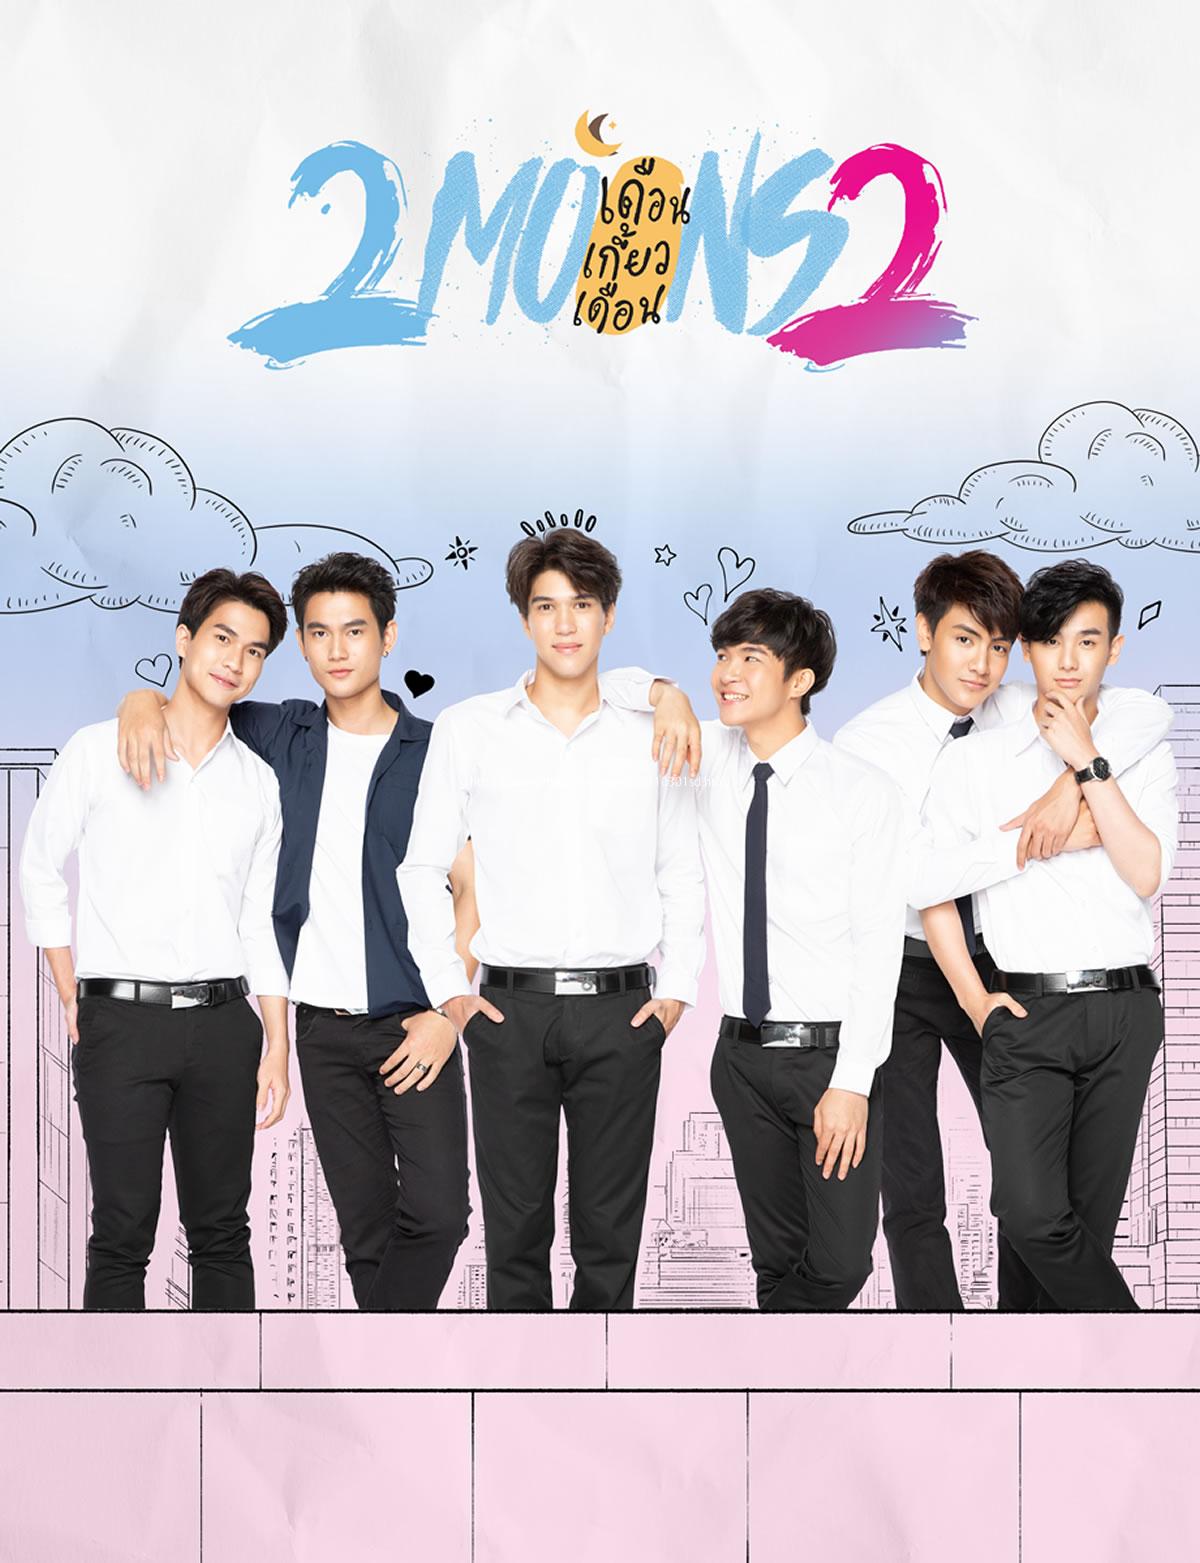 タイBLドラマ「2Moons2」がRakuten TVで独占先行配信決定